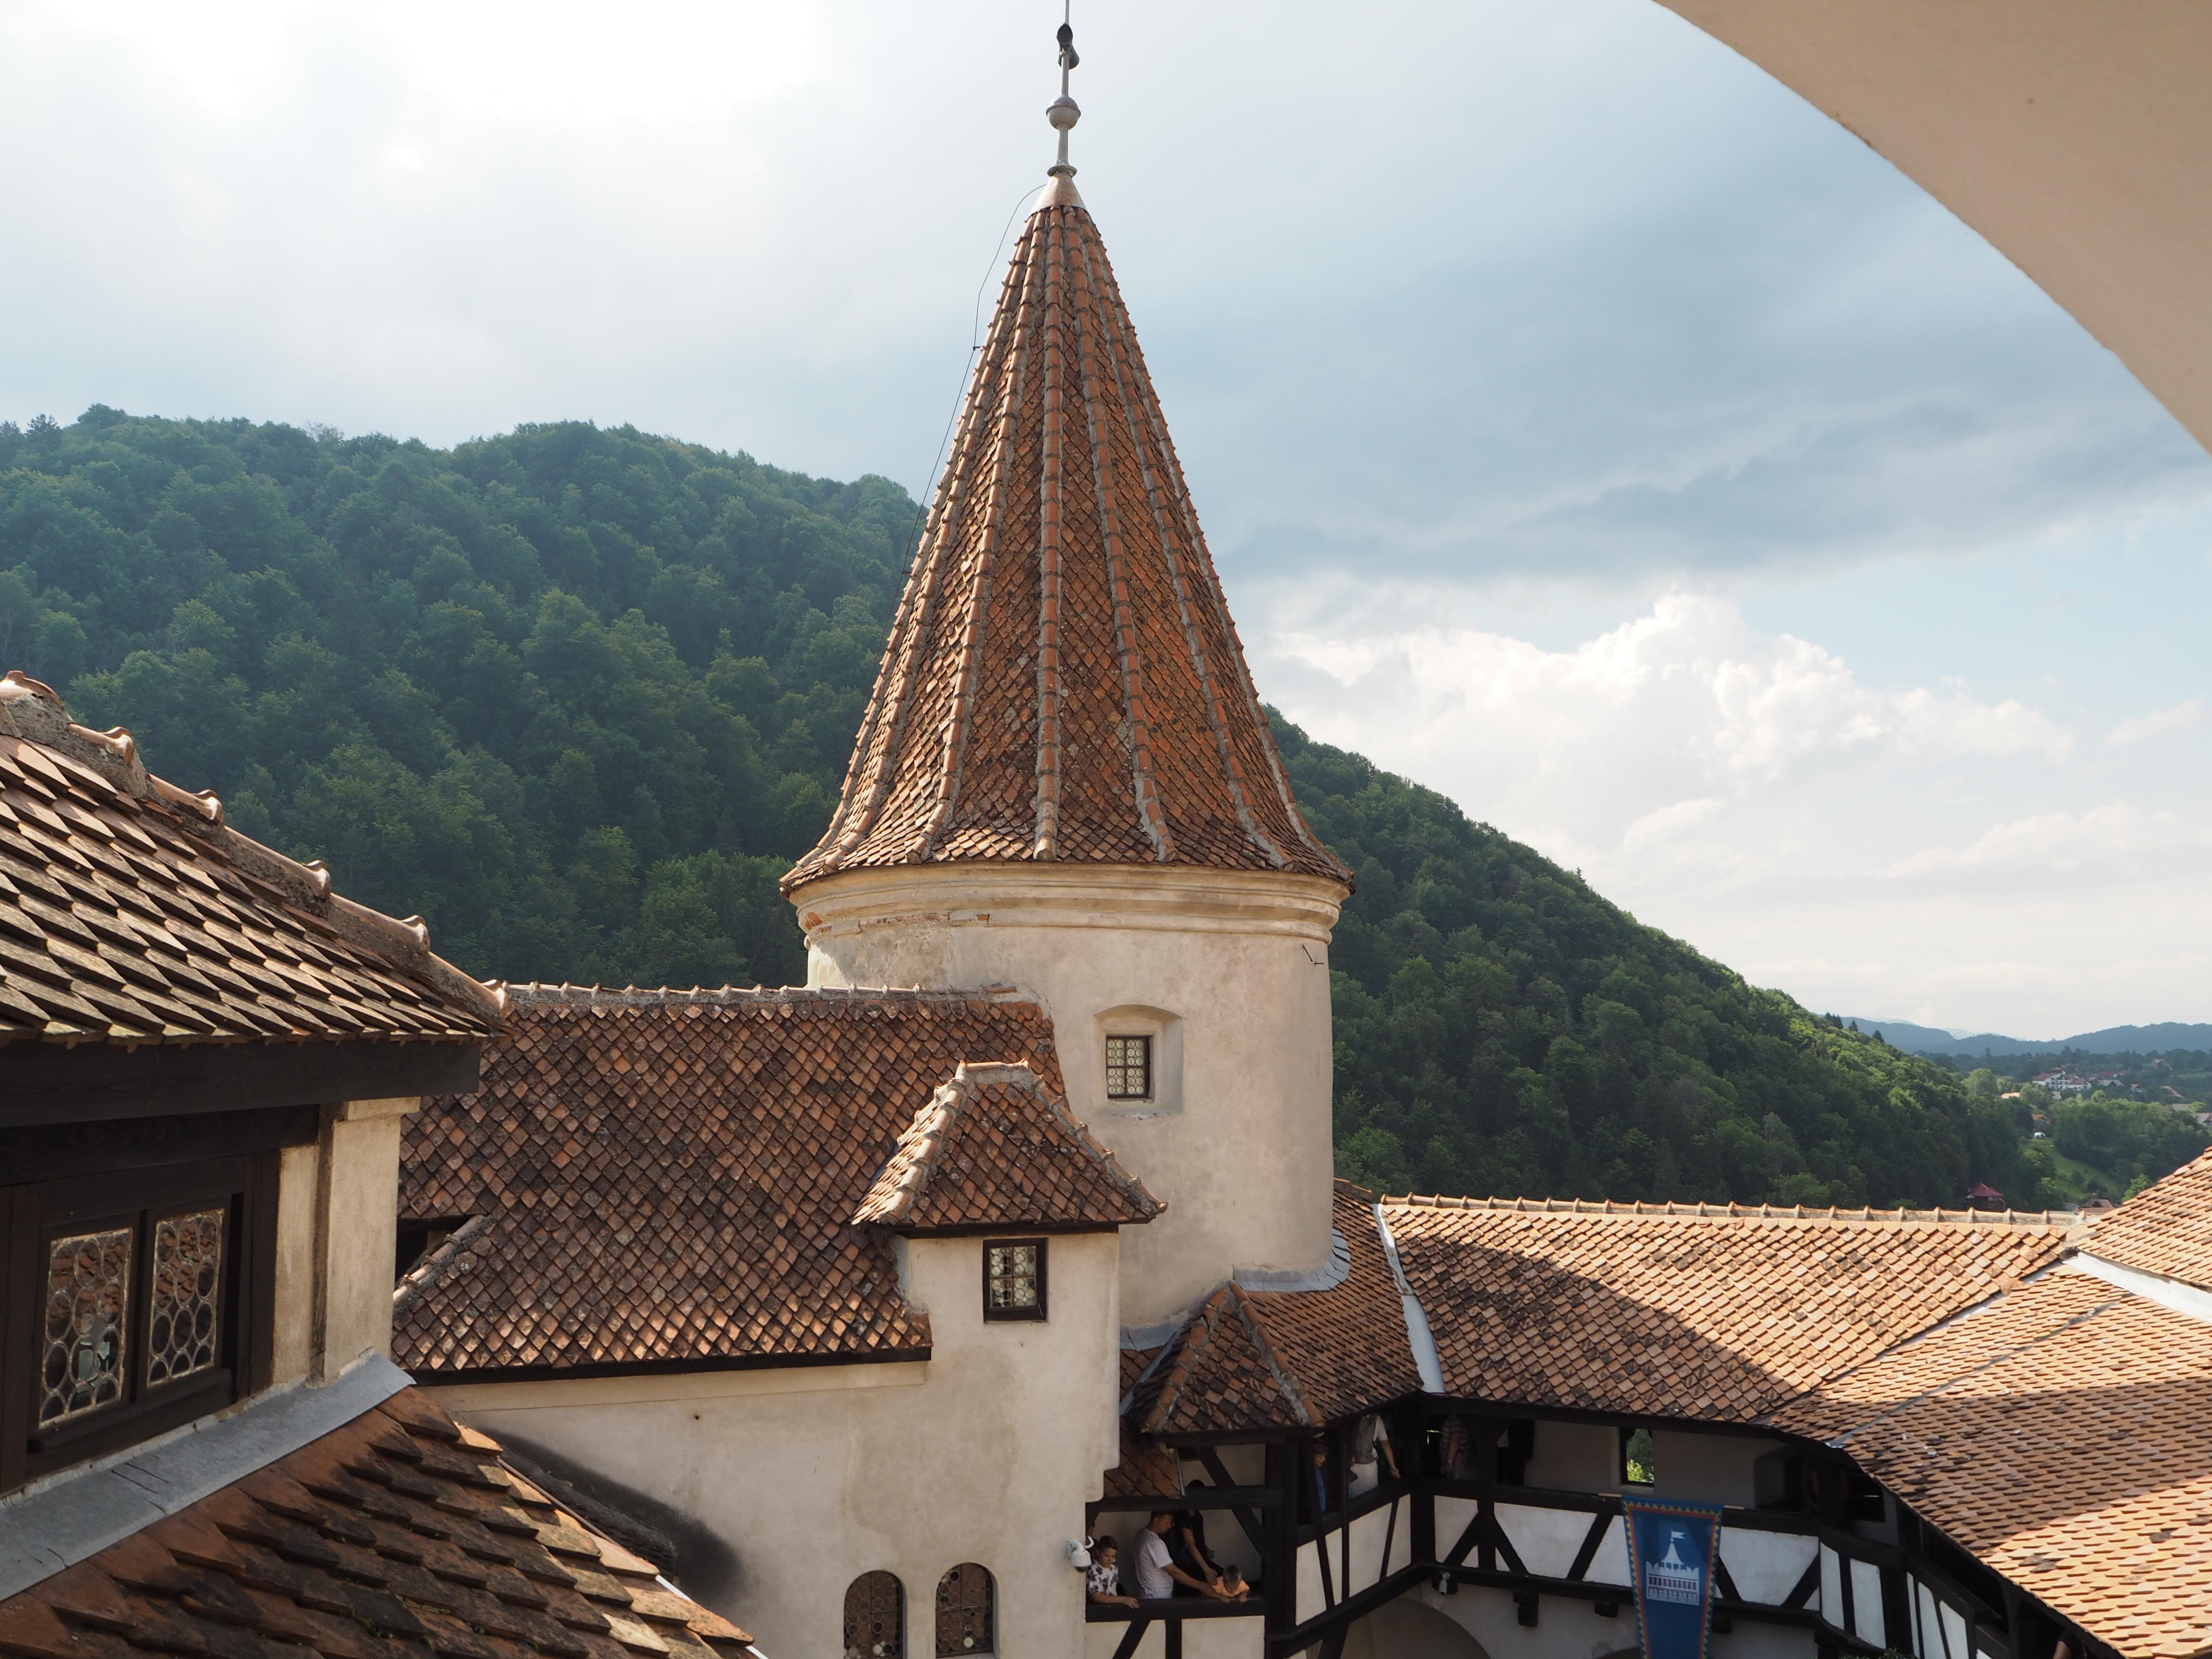 Travelguide Brasov, Umgebung und Draculaschloss Bran